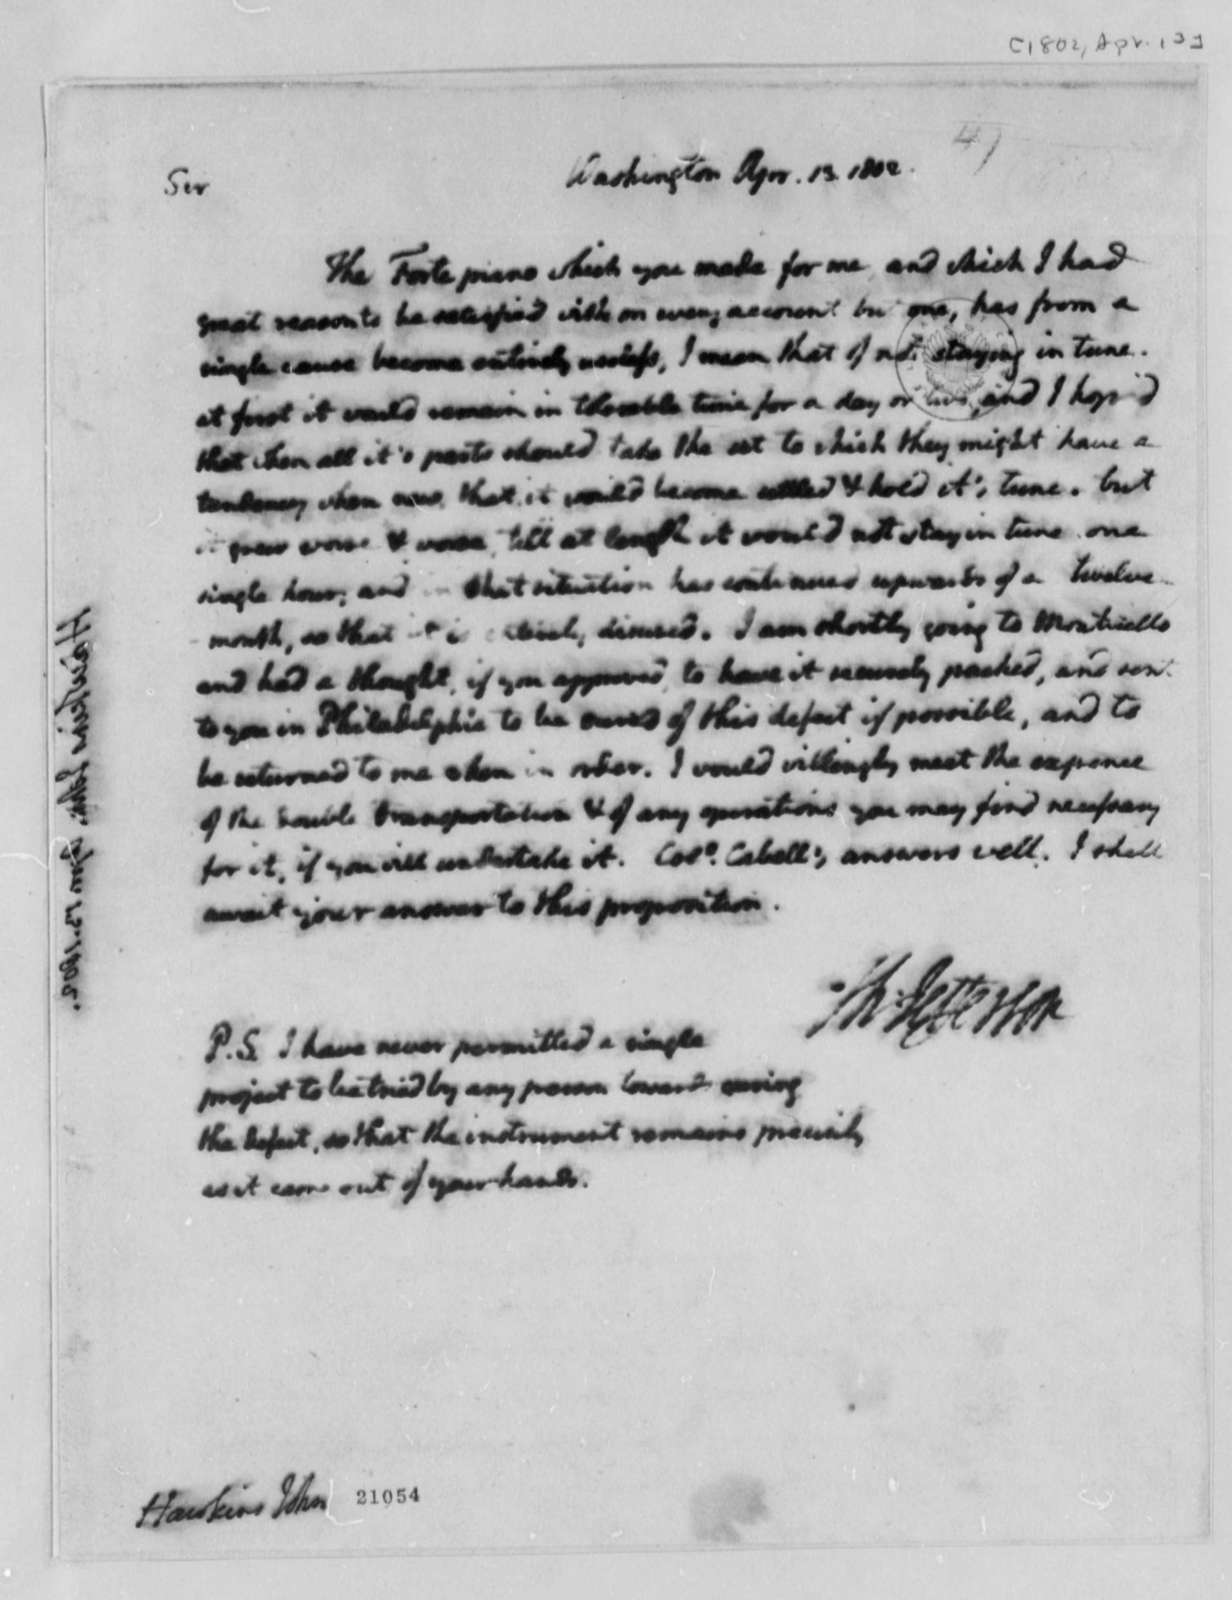 Thomas Jefferson to John Isaac Hawkins, April 13, 1802